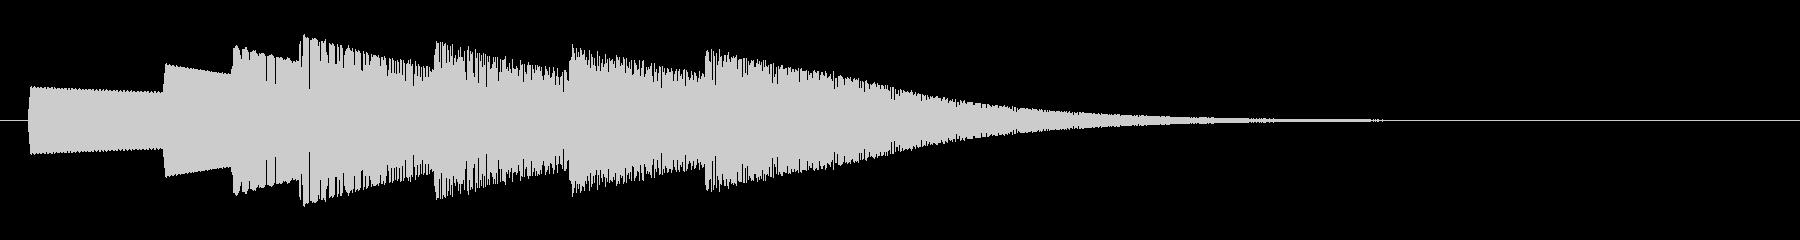 KANT入店音ジングル010142の未再生の波形